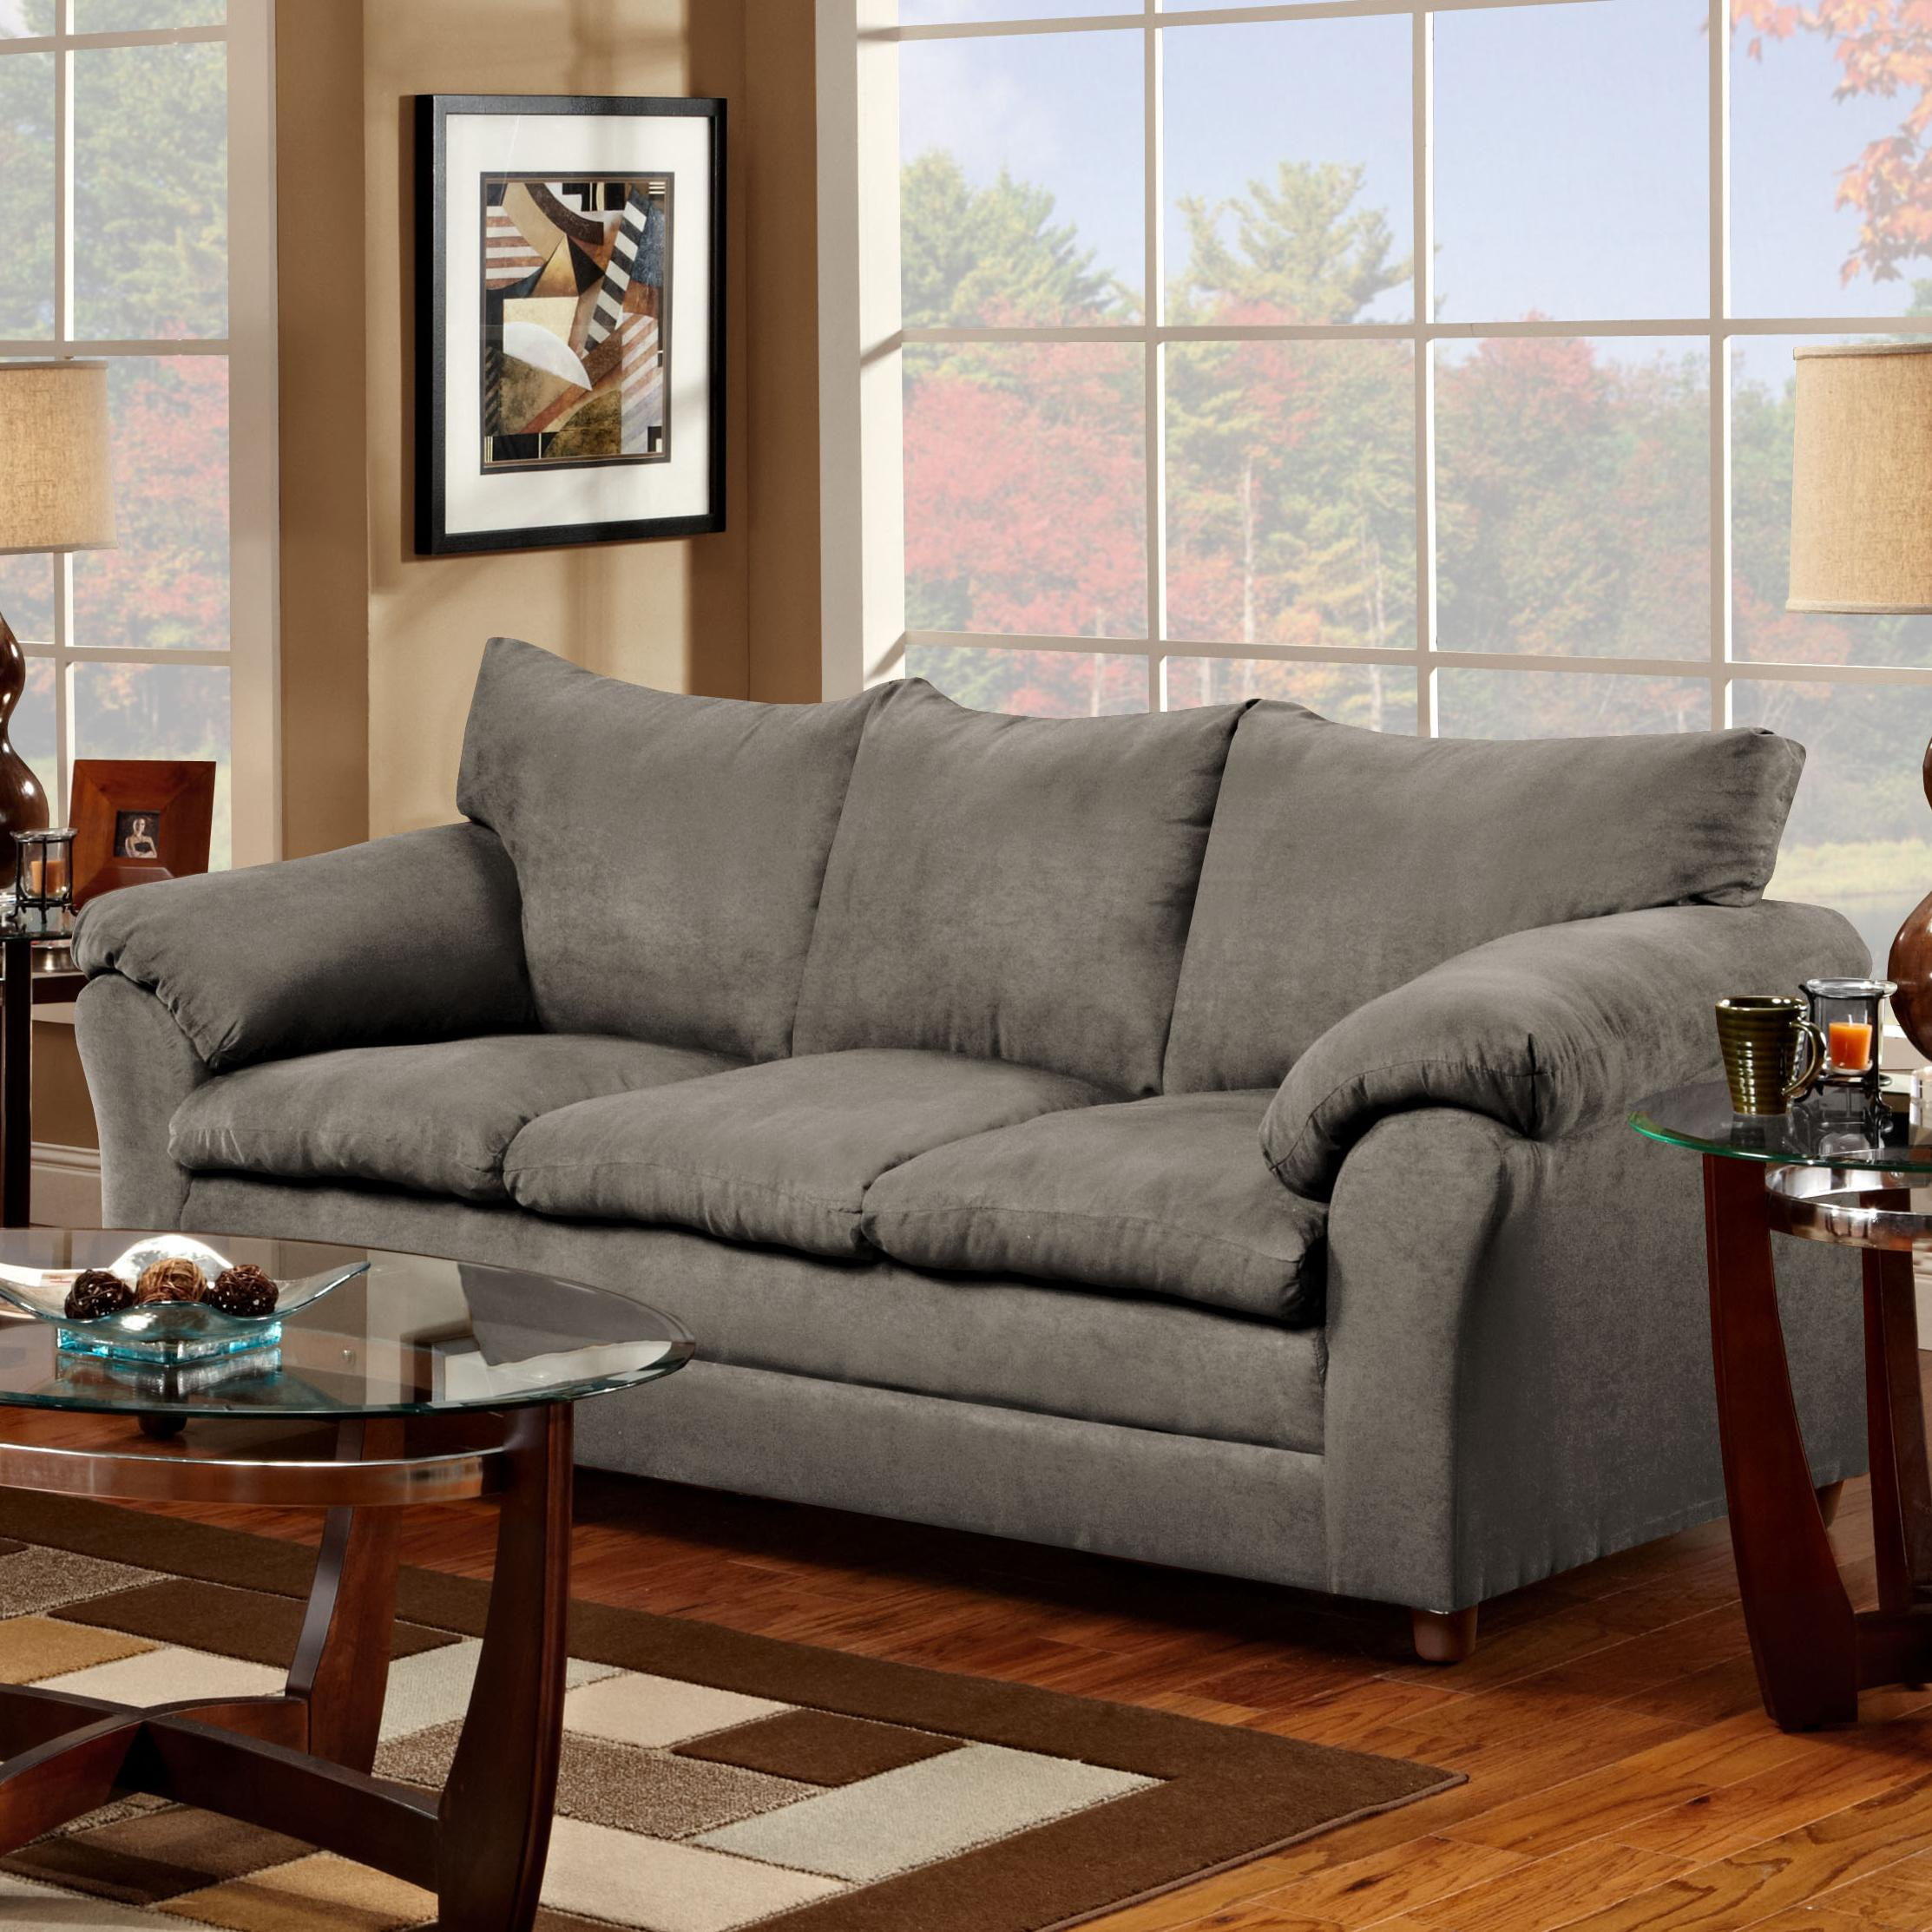 1150 Sofa by Washington Furniture at VanDrie Home Furnishings